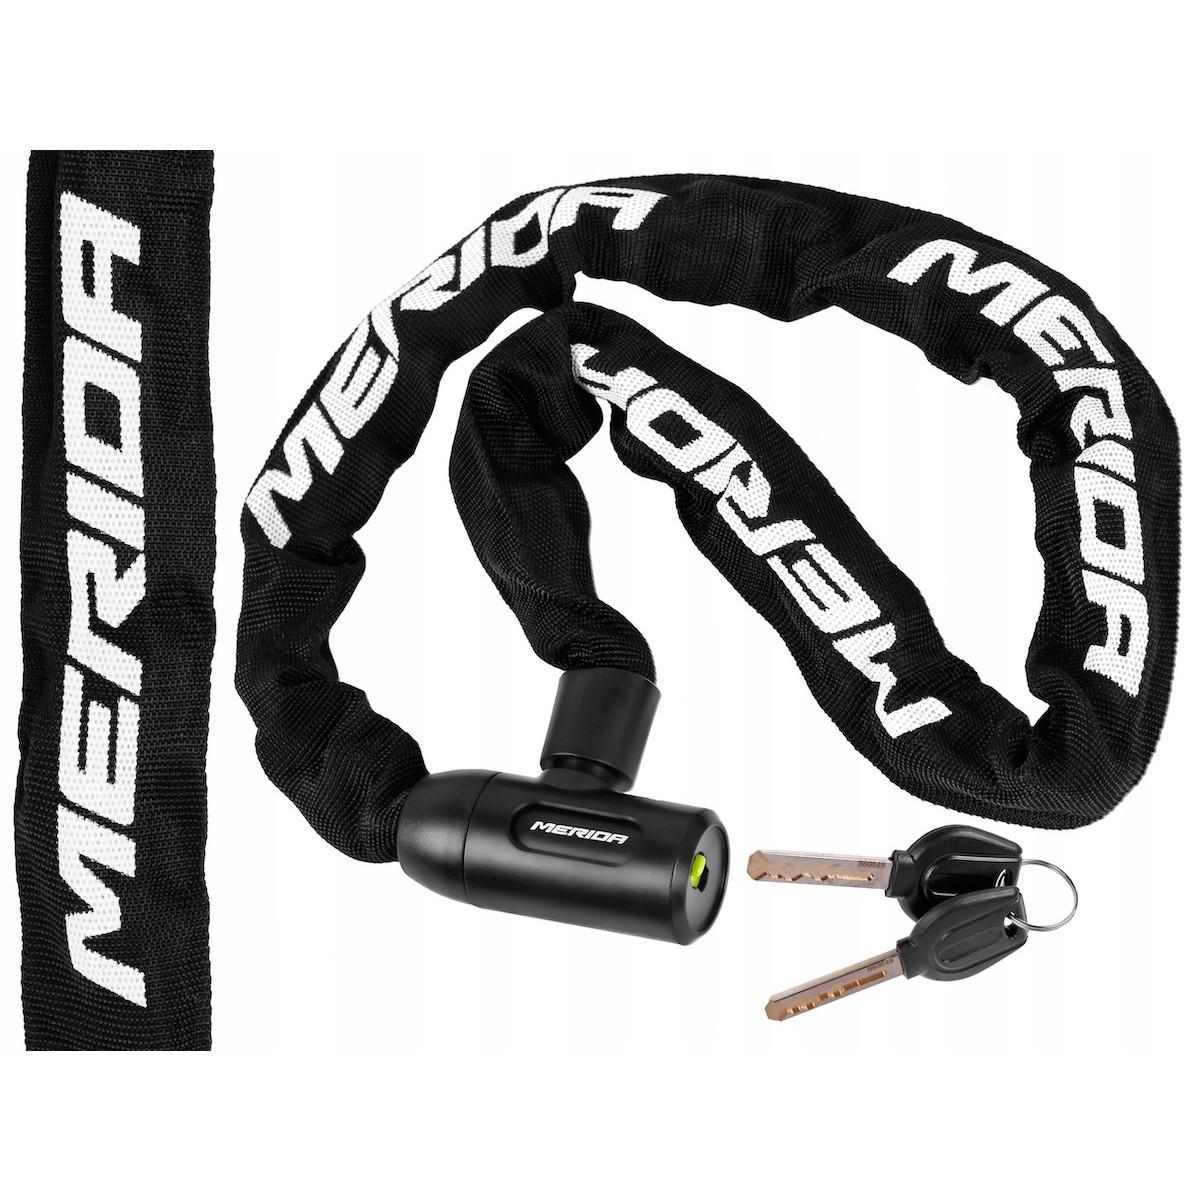 Zámok na bicykel oceľový kábel 6x900mm LC-MD019 megamix.sk